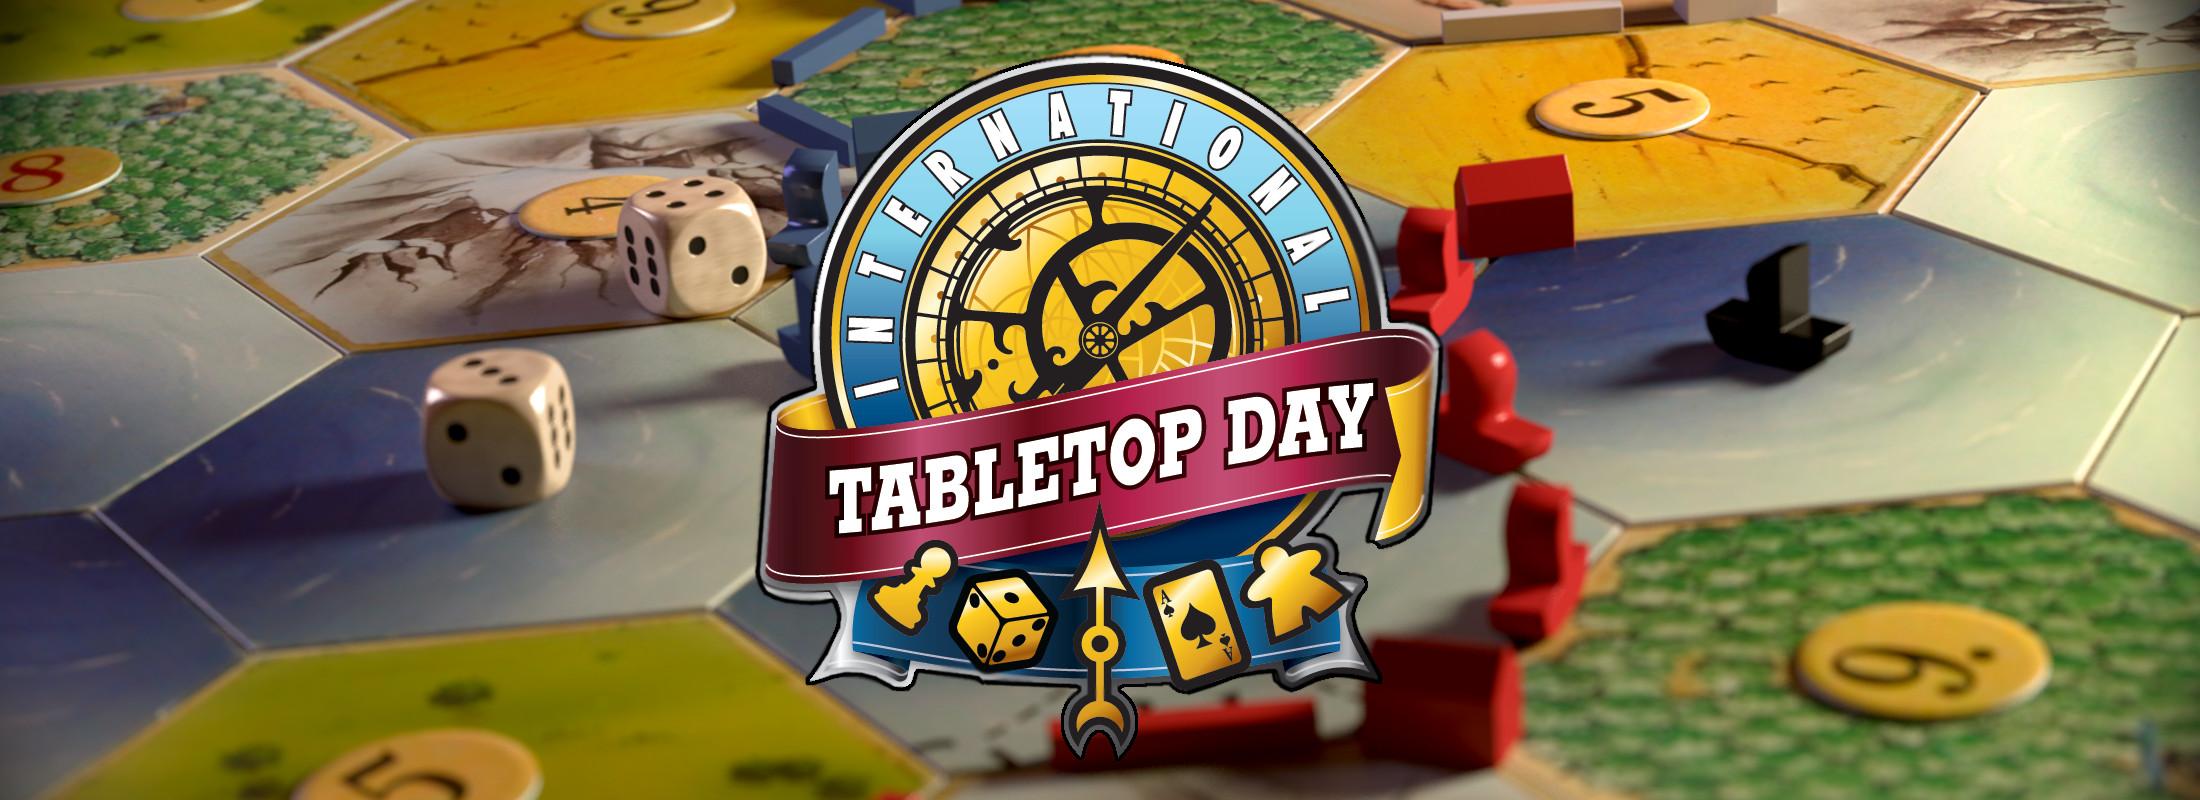 TableTopDayBanner